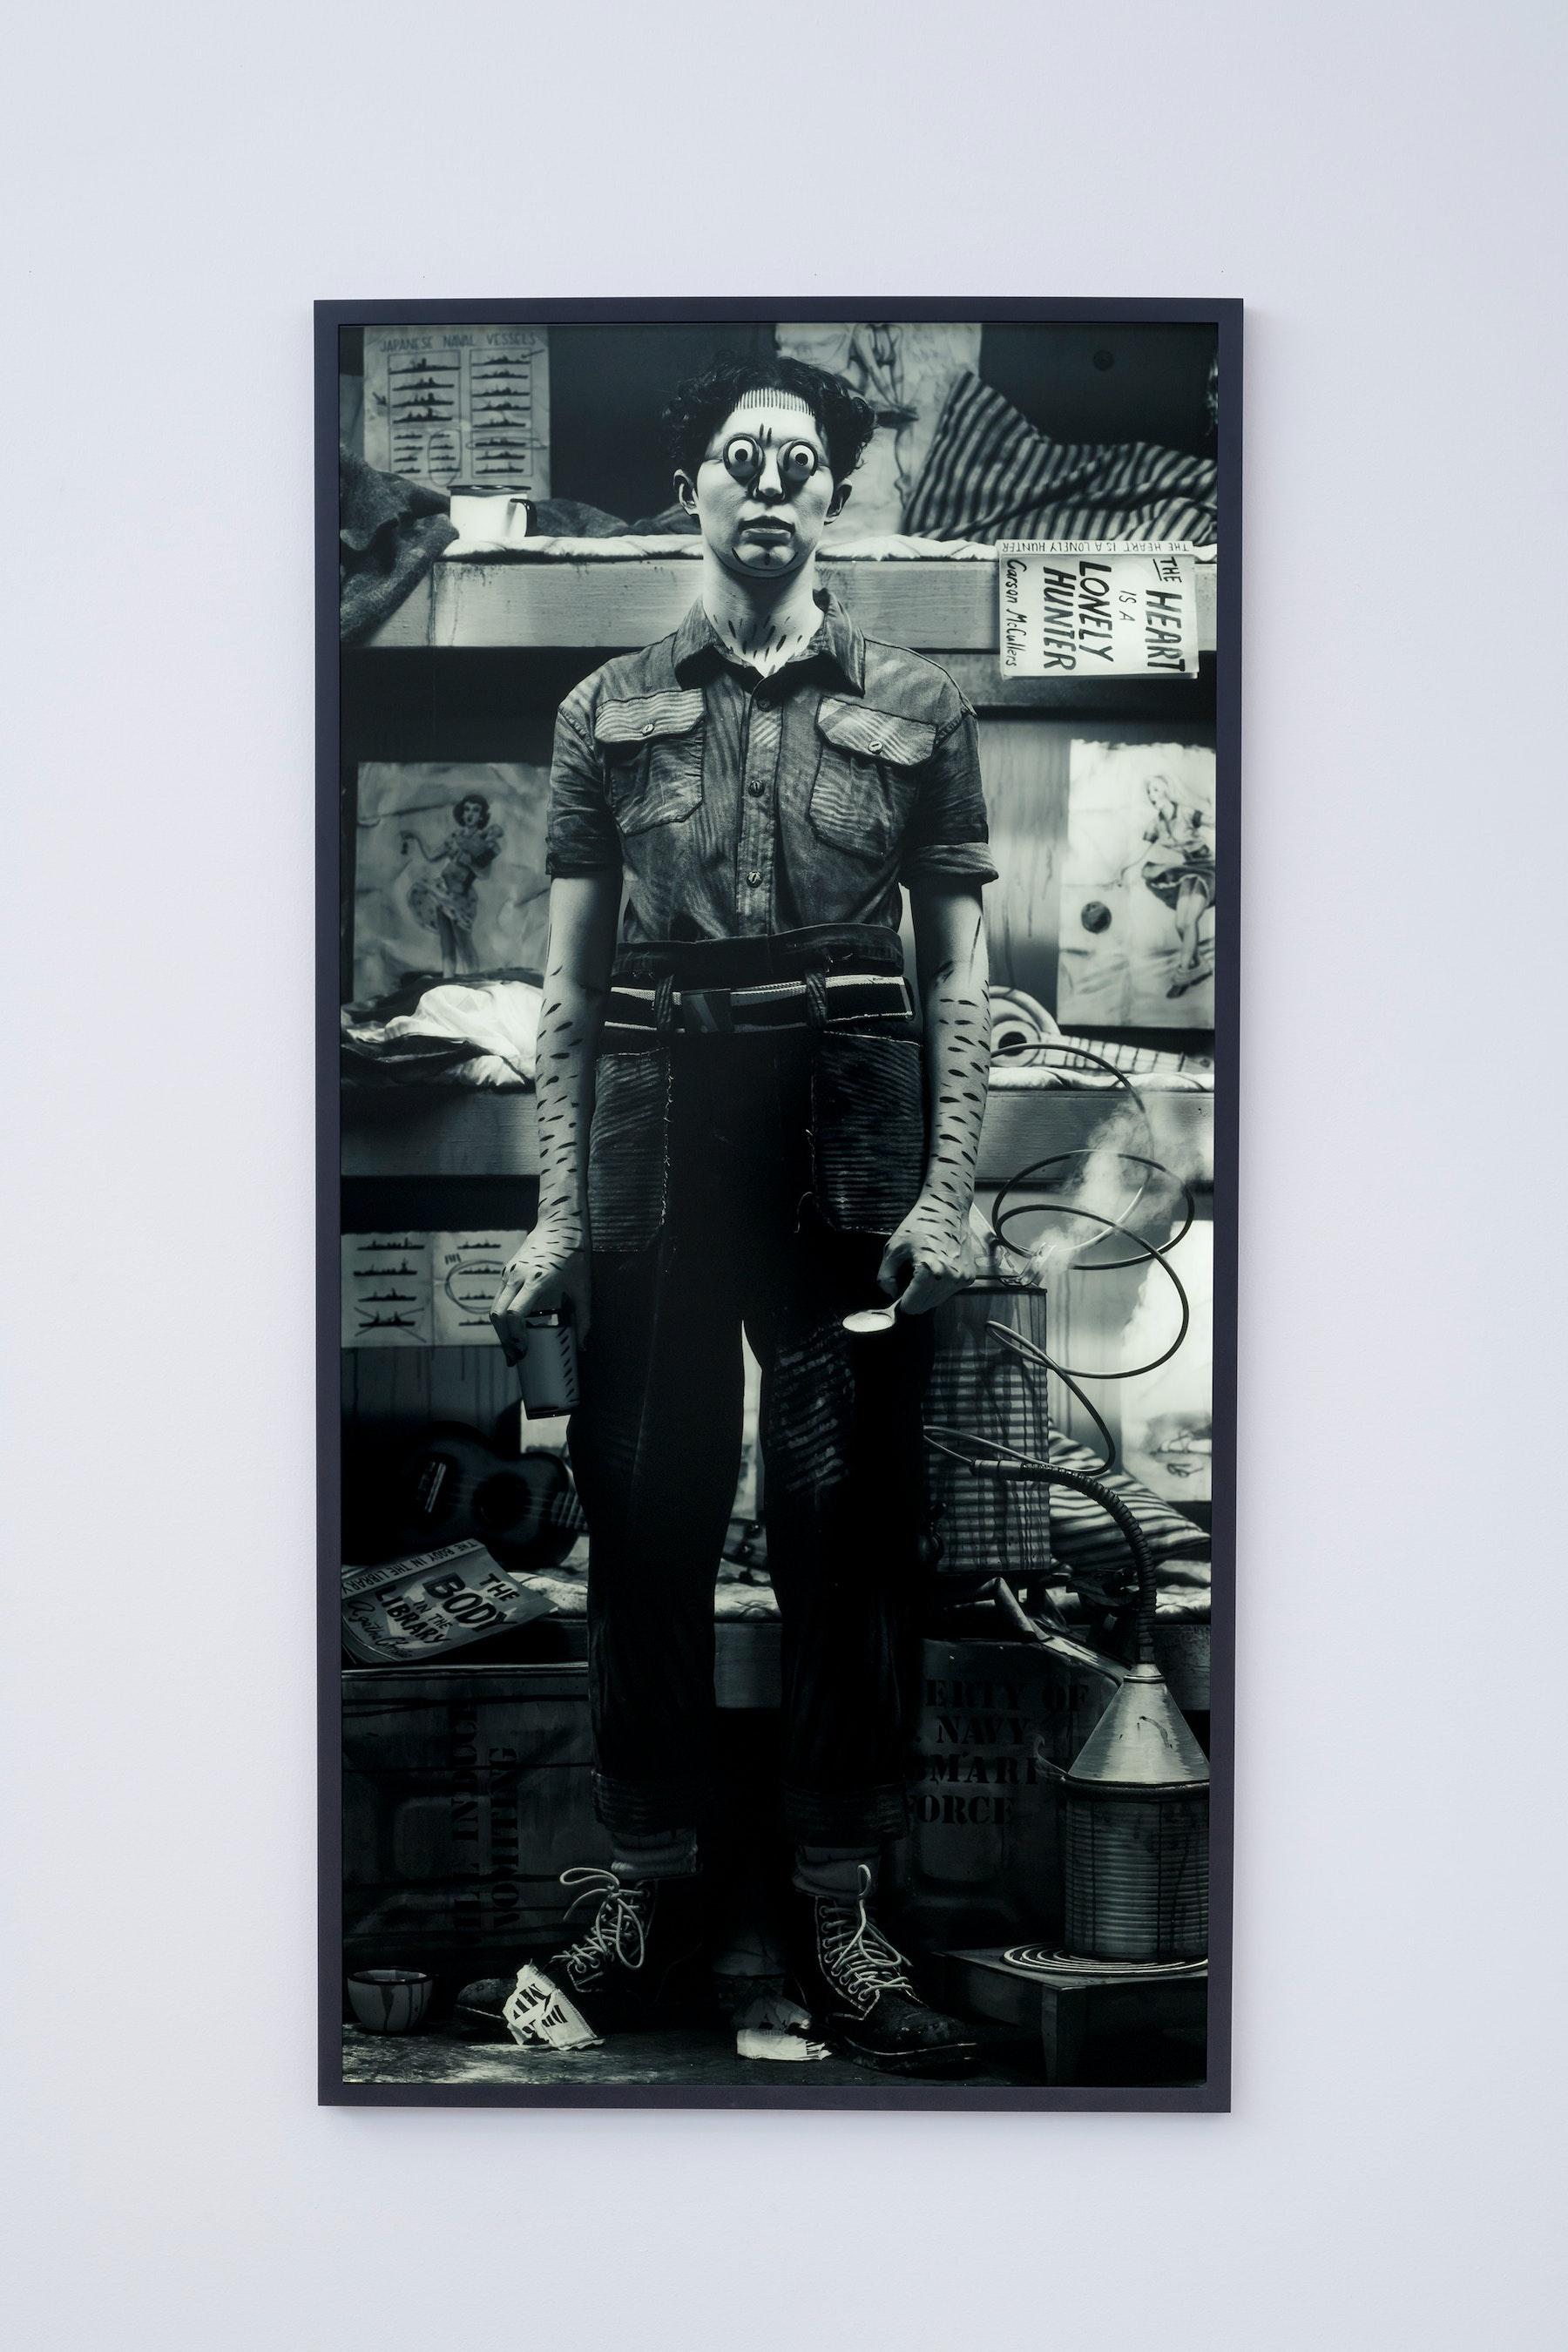 "Mary Reid Kelley, Patrick Kelley ""Torpedo Juice,"" 2017 Photograph, transparency on lightbox 73 ¹⁄₄"" x 37 ¹⁄₄"" x 1 ¹⁄₂"" [HxWxD] (186.06 x 94.62 x 3.81 cm) Edition 3 of 4, 2 AP Inventory #MRK156.03 Courtesy of the artist and Vielmetter Los Angeles Photo credit: Robert Wedemeyer"